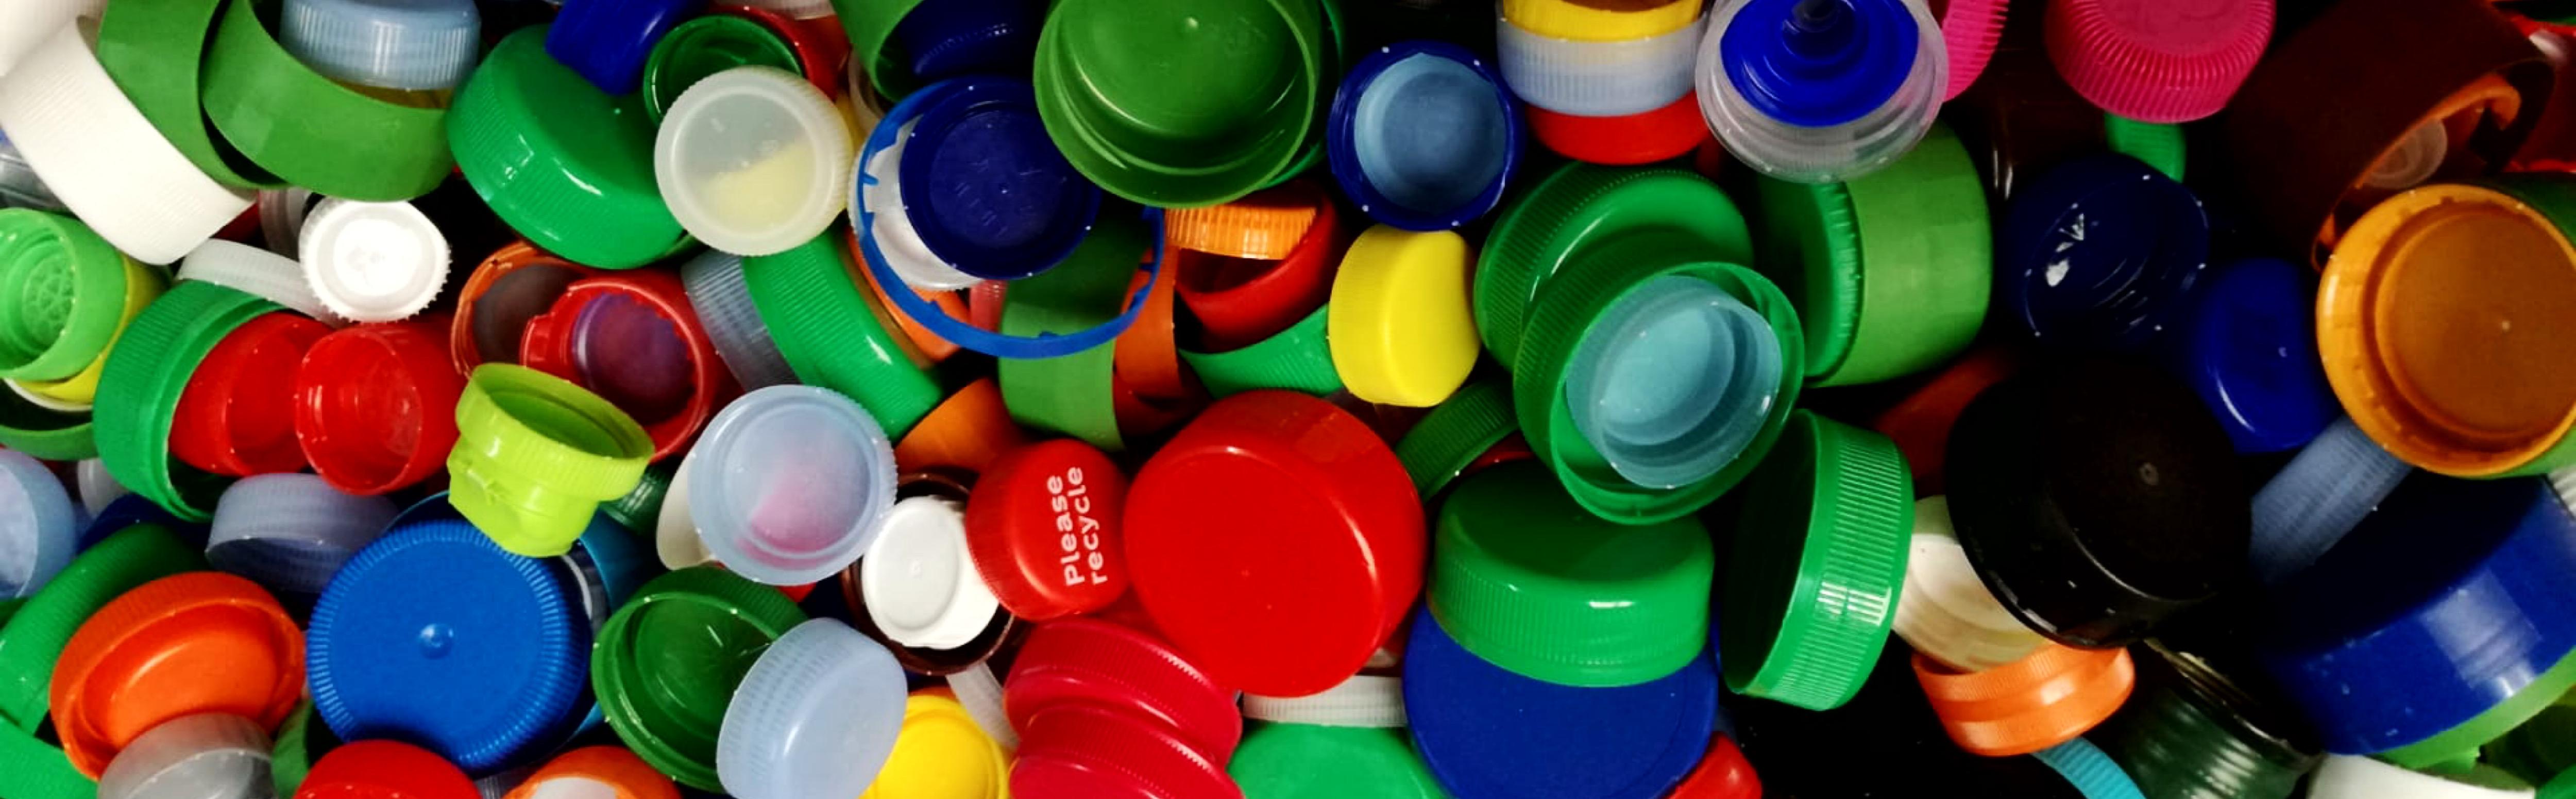 plastic-dopjes_5f99b0f8592c3_phpY0YxaN